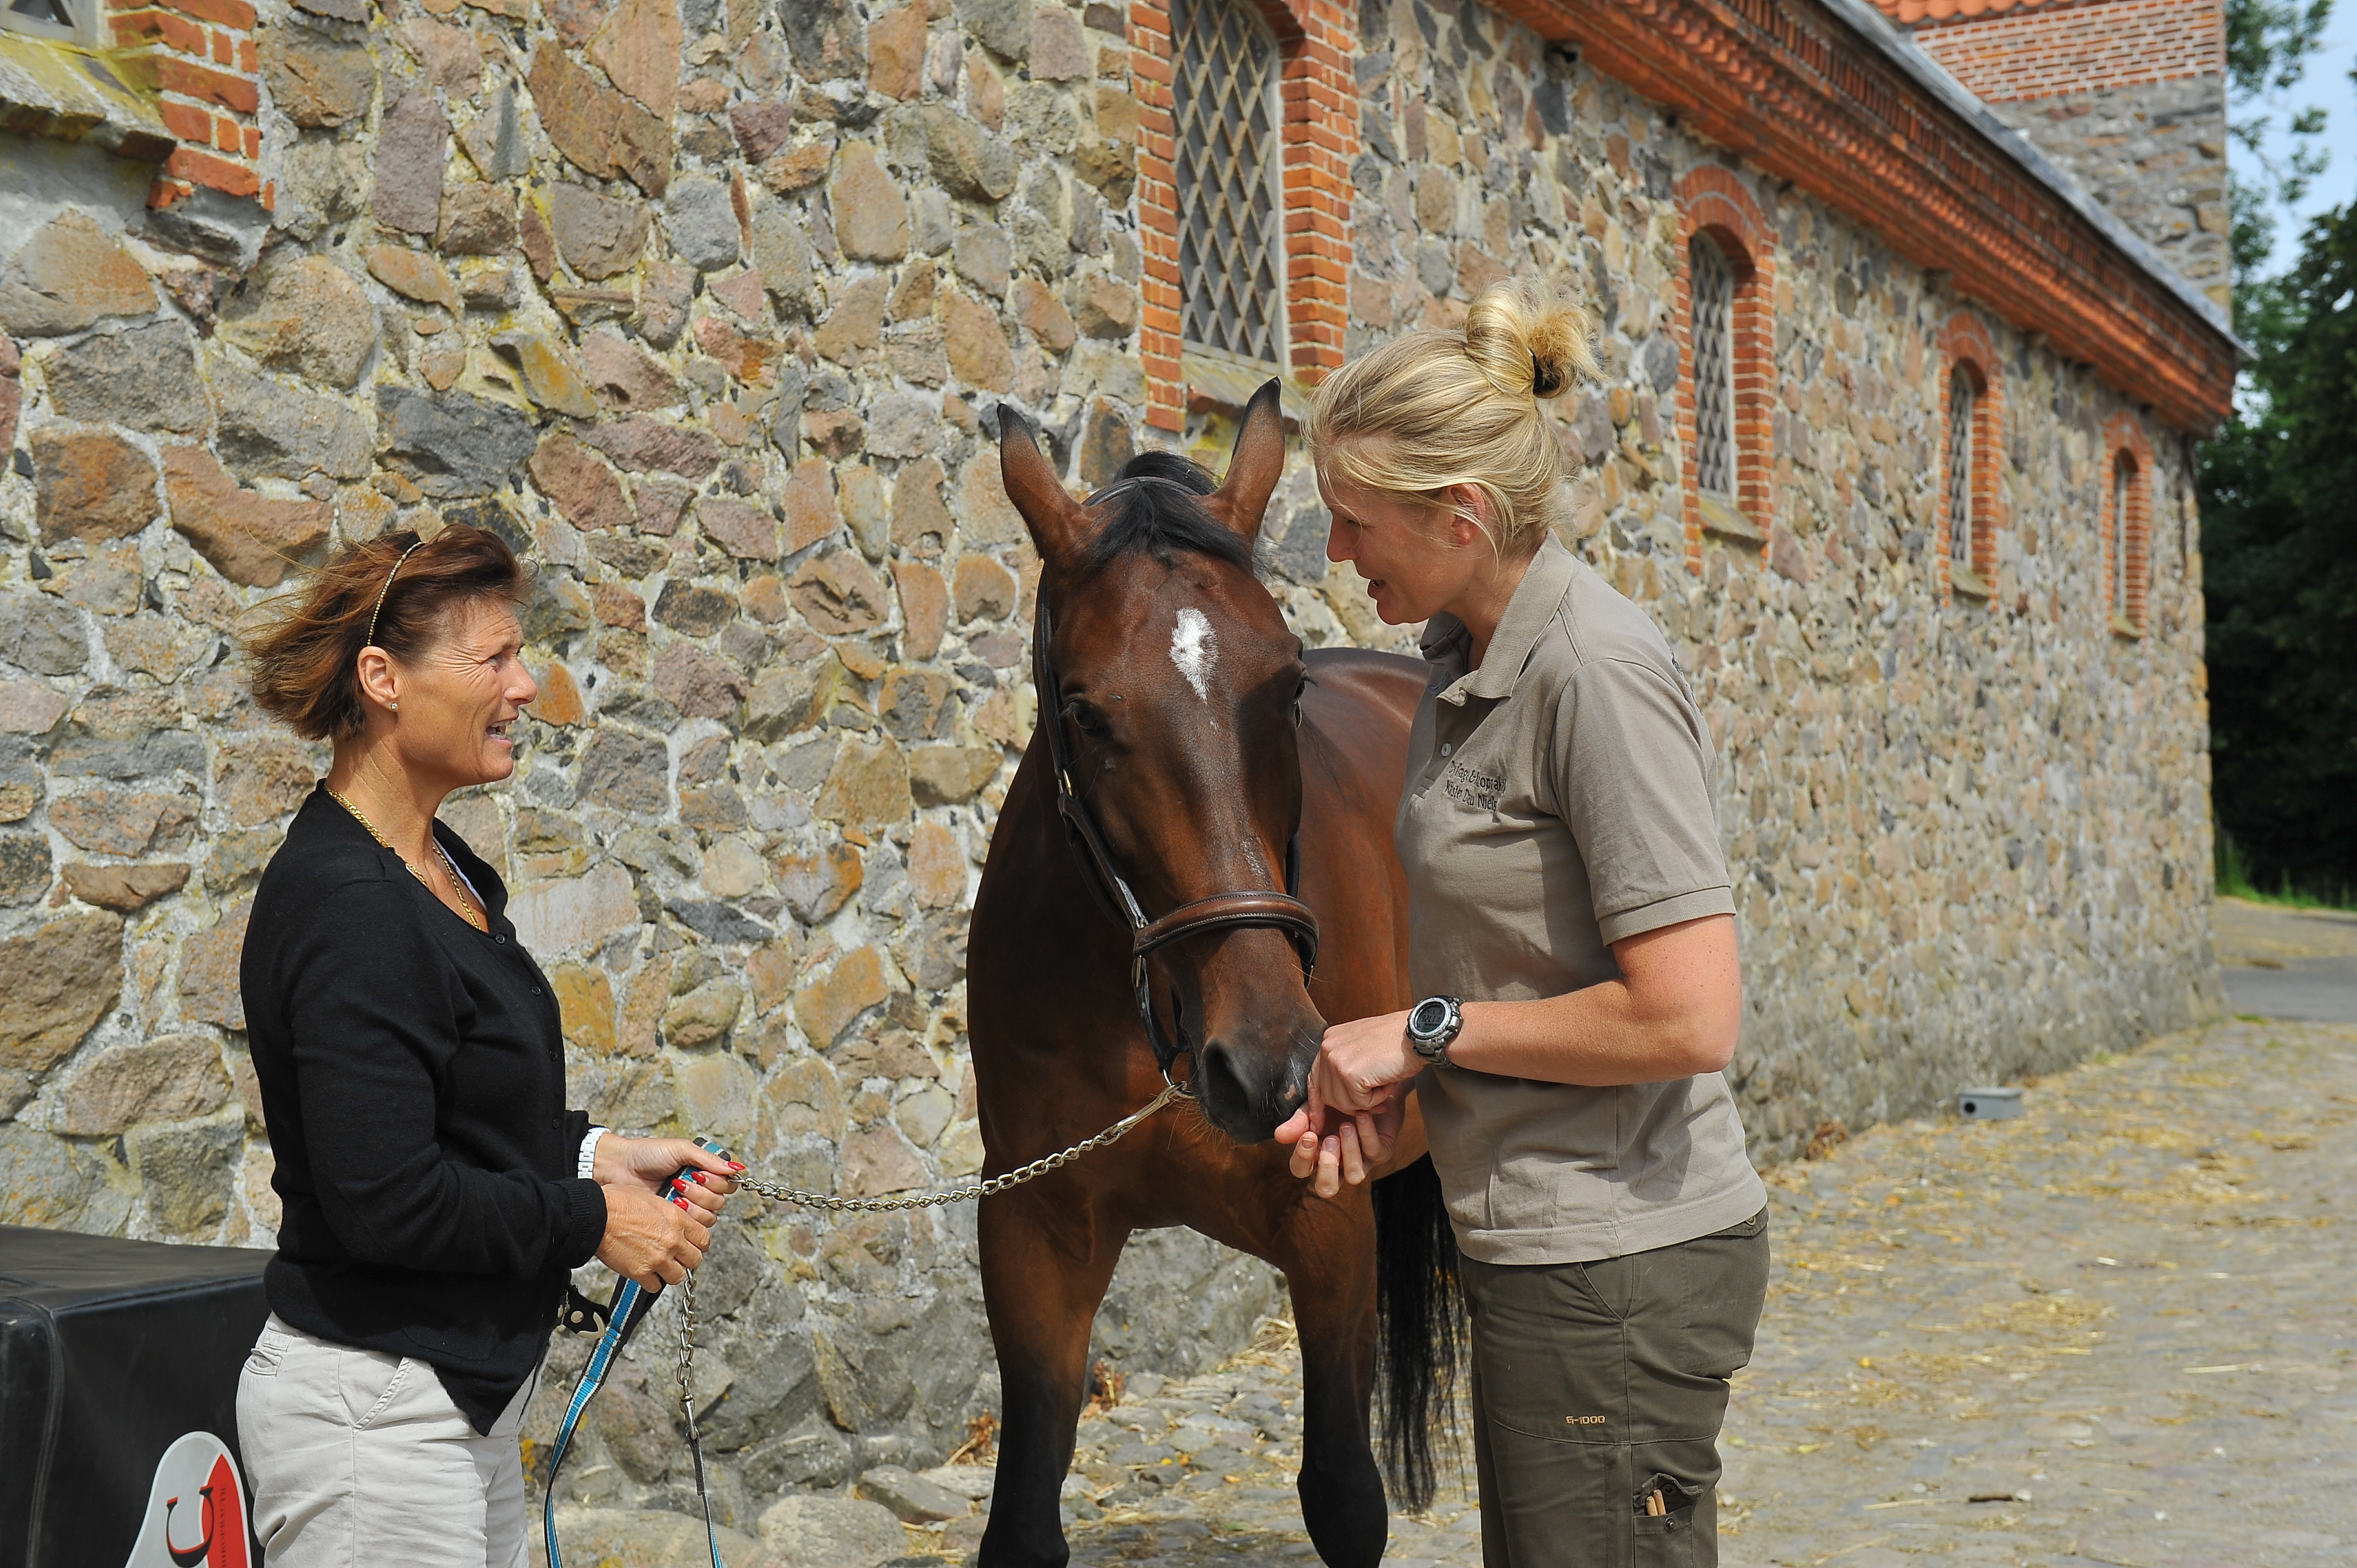 Kiropraktik hest 6